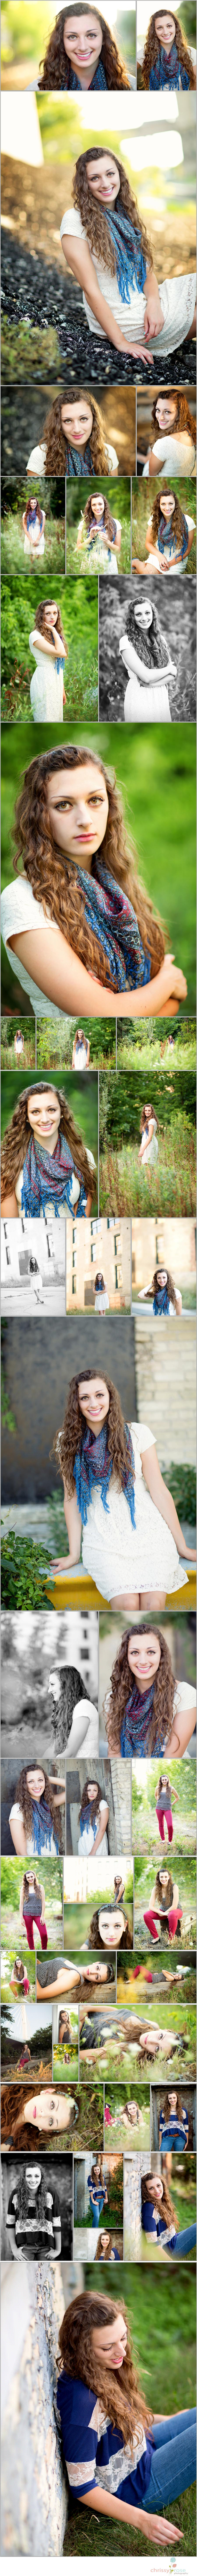 Blog Collage-1351803852559